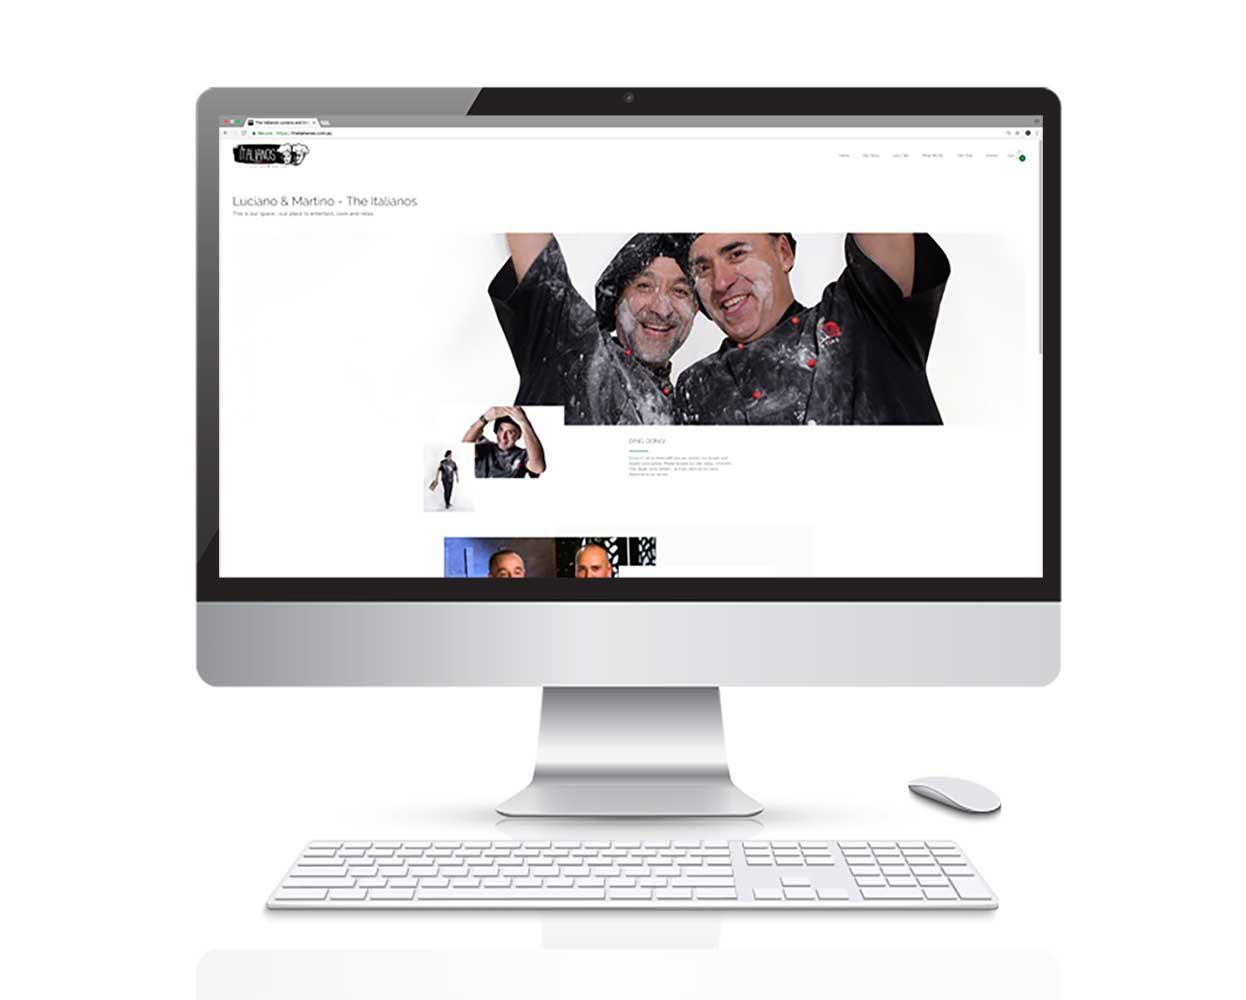 The Italianos branding - website